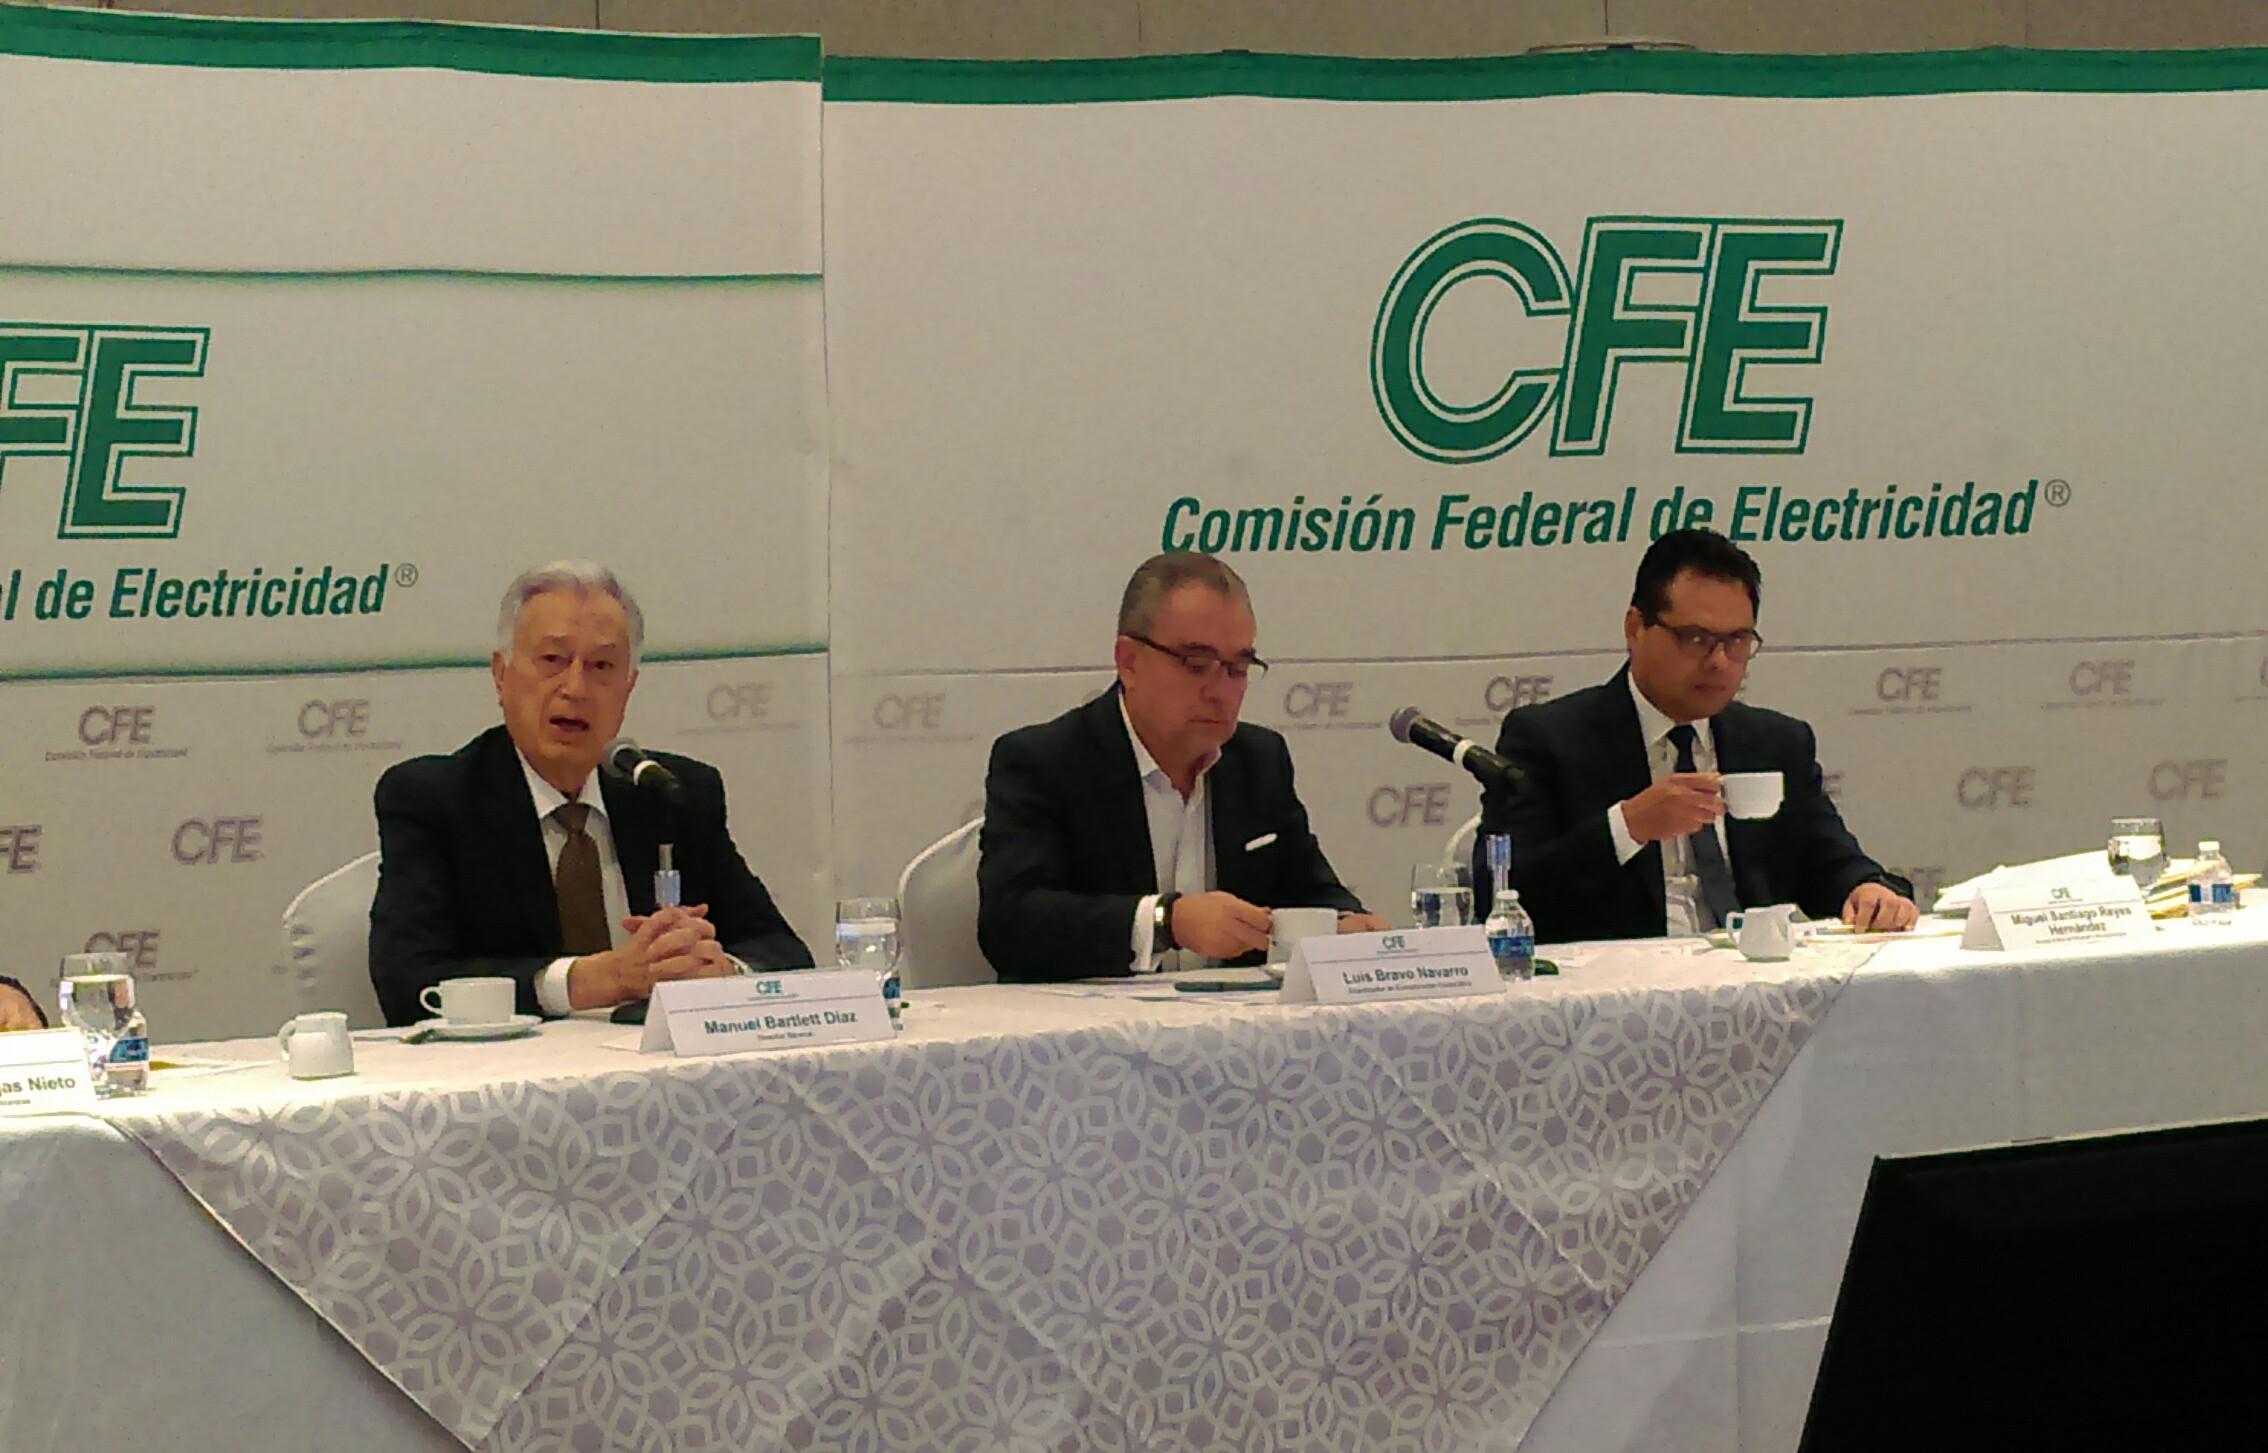 Dice CFE que pagó 5,800 mdp por gas que no recibió